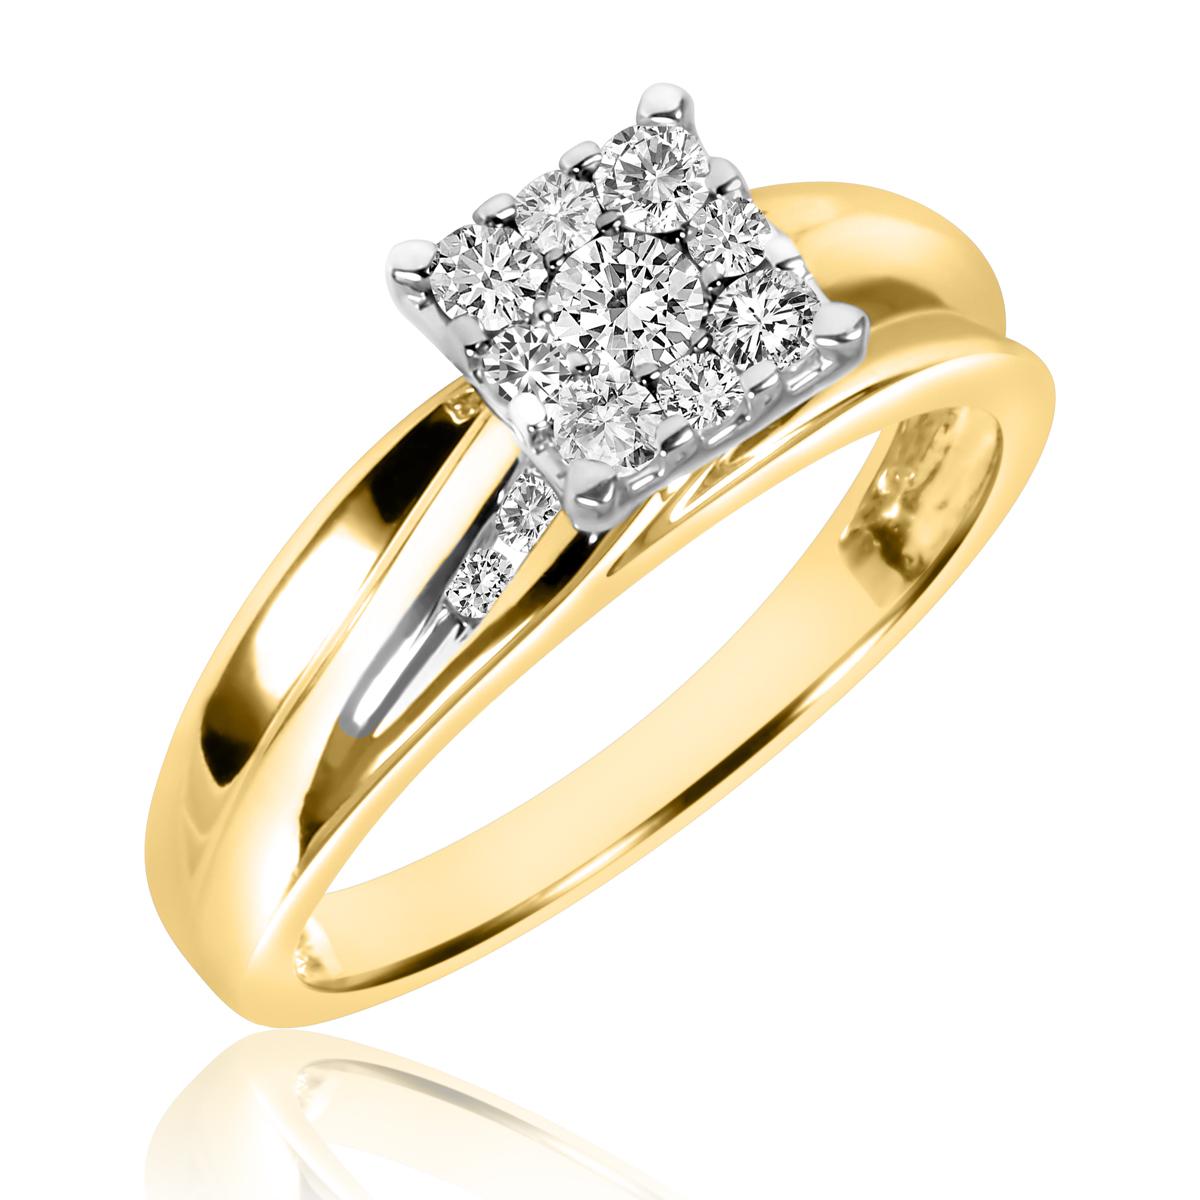 3/8 CT. T.W. Round Cut Diamond Ladies Engagement Ring 14K Yellow Gold- Size 8